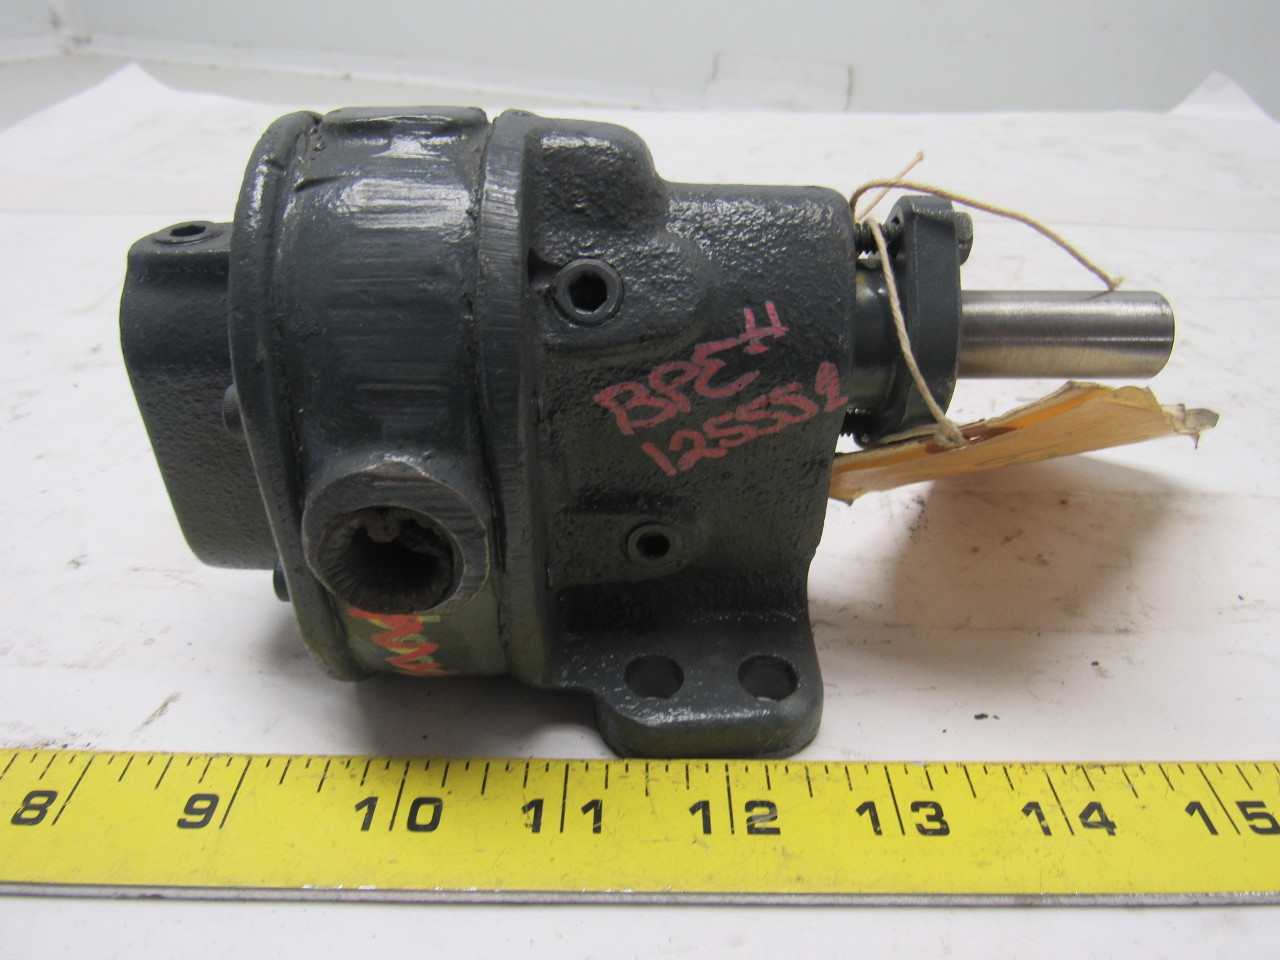 "Brown & Sharpe No. 1 Hydraulic Rotary Gear Pump 1.1 GPM at 200PSI 9/16"" Shaft"